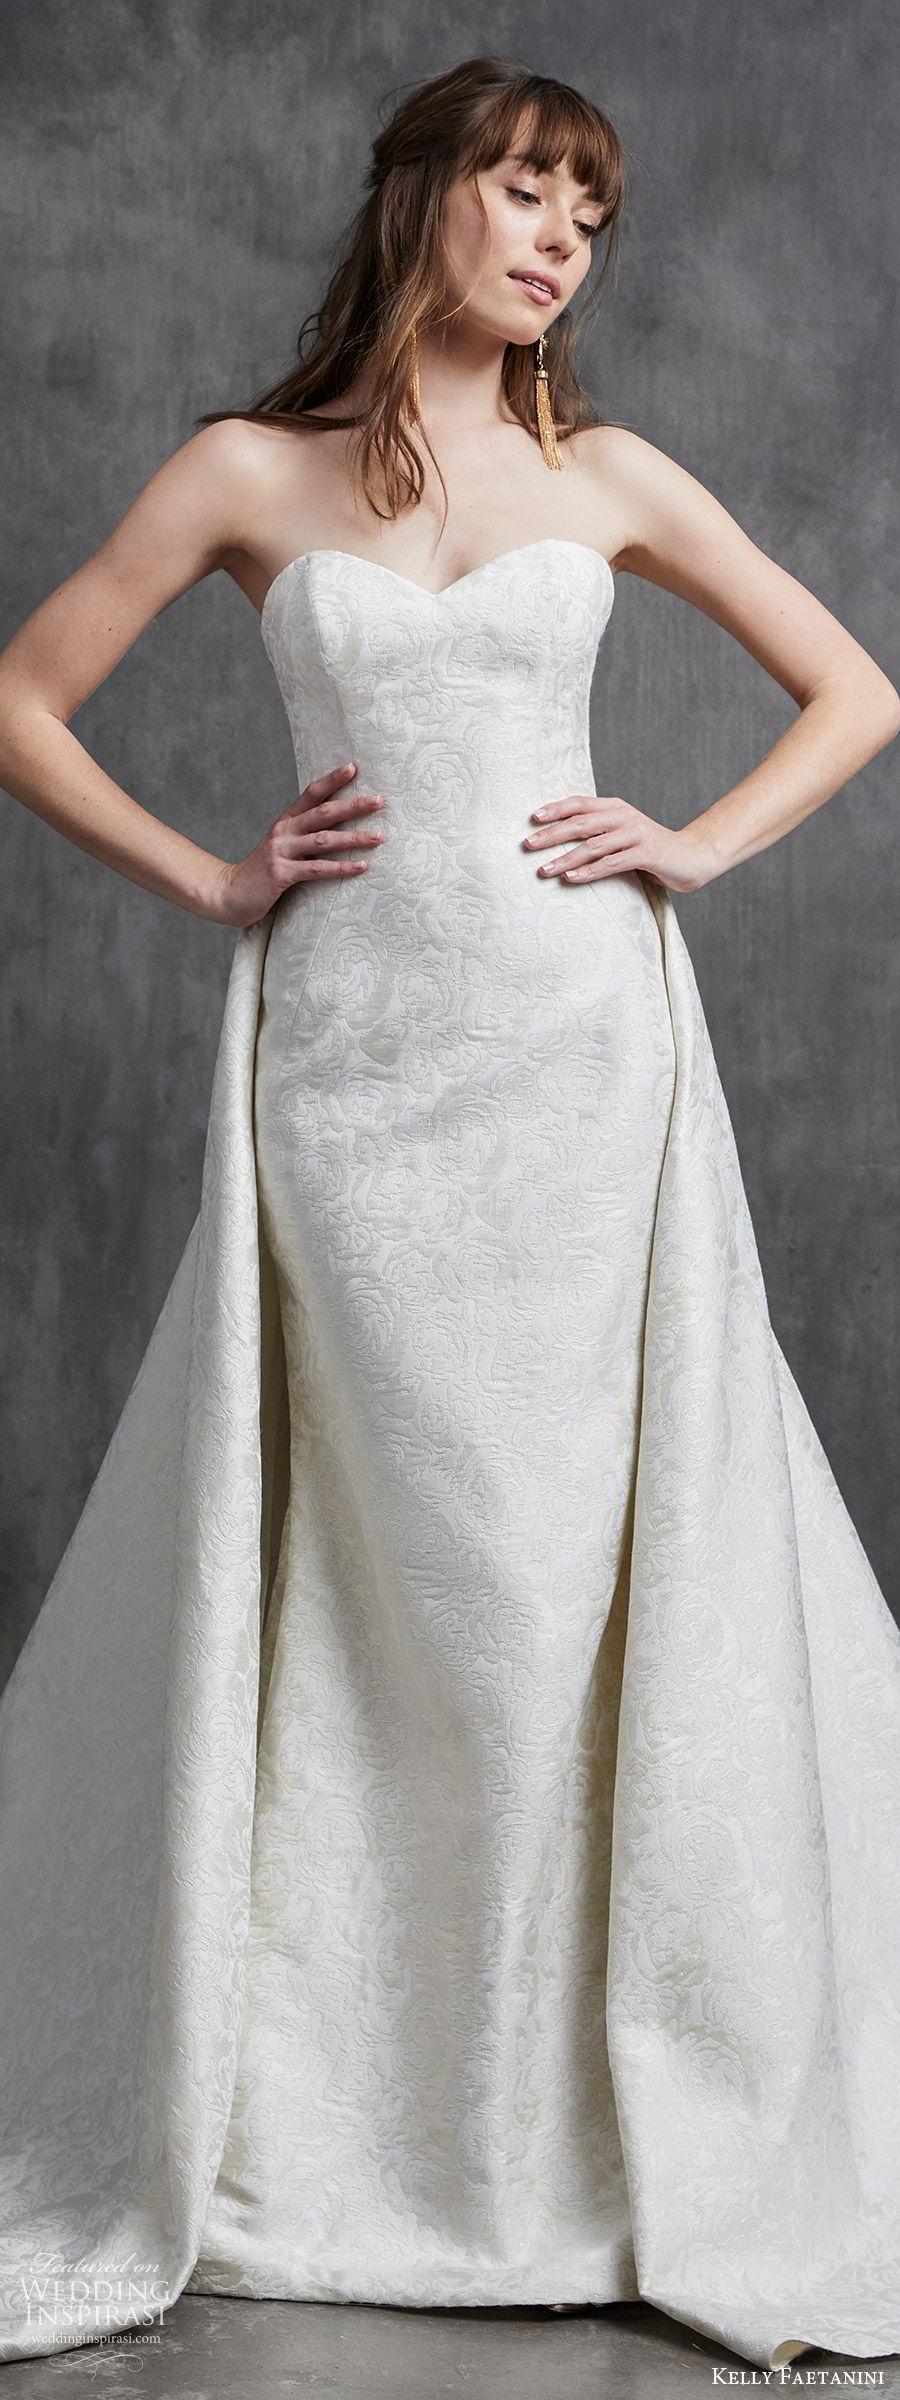 kelly faetanini spring 2020 bridal strapless sweetheart sheath mermaid embellished wedding dress (9) a line overskirt chapel train elegant classic lv